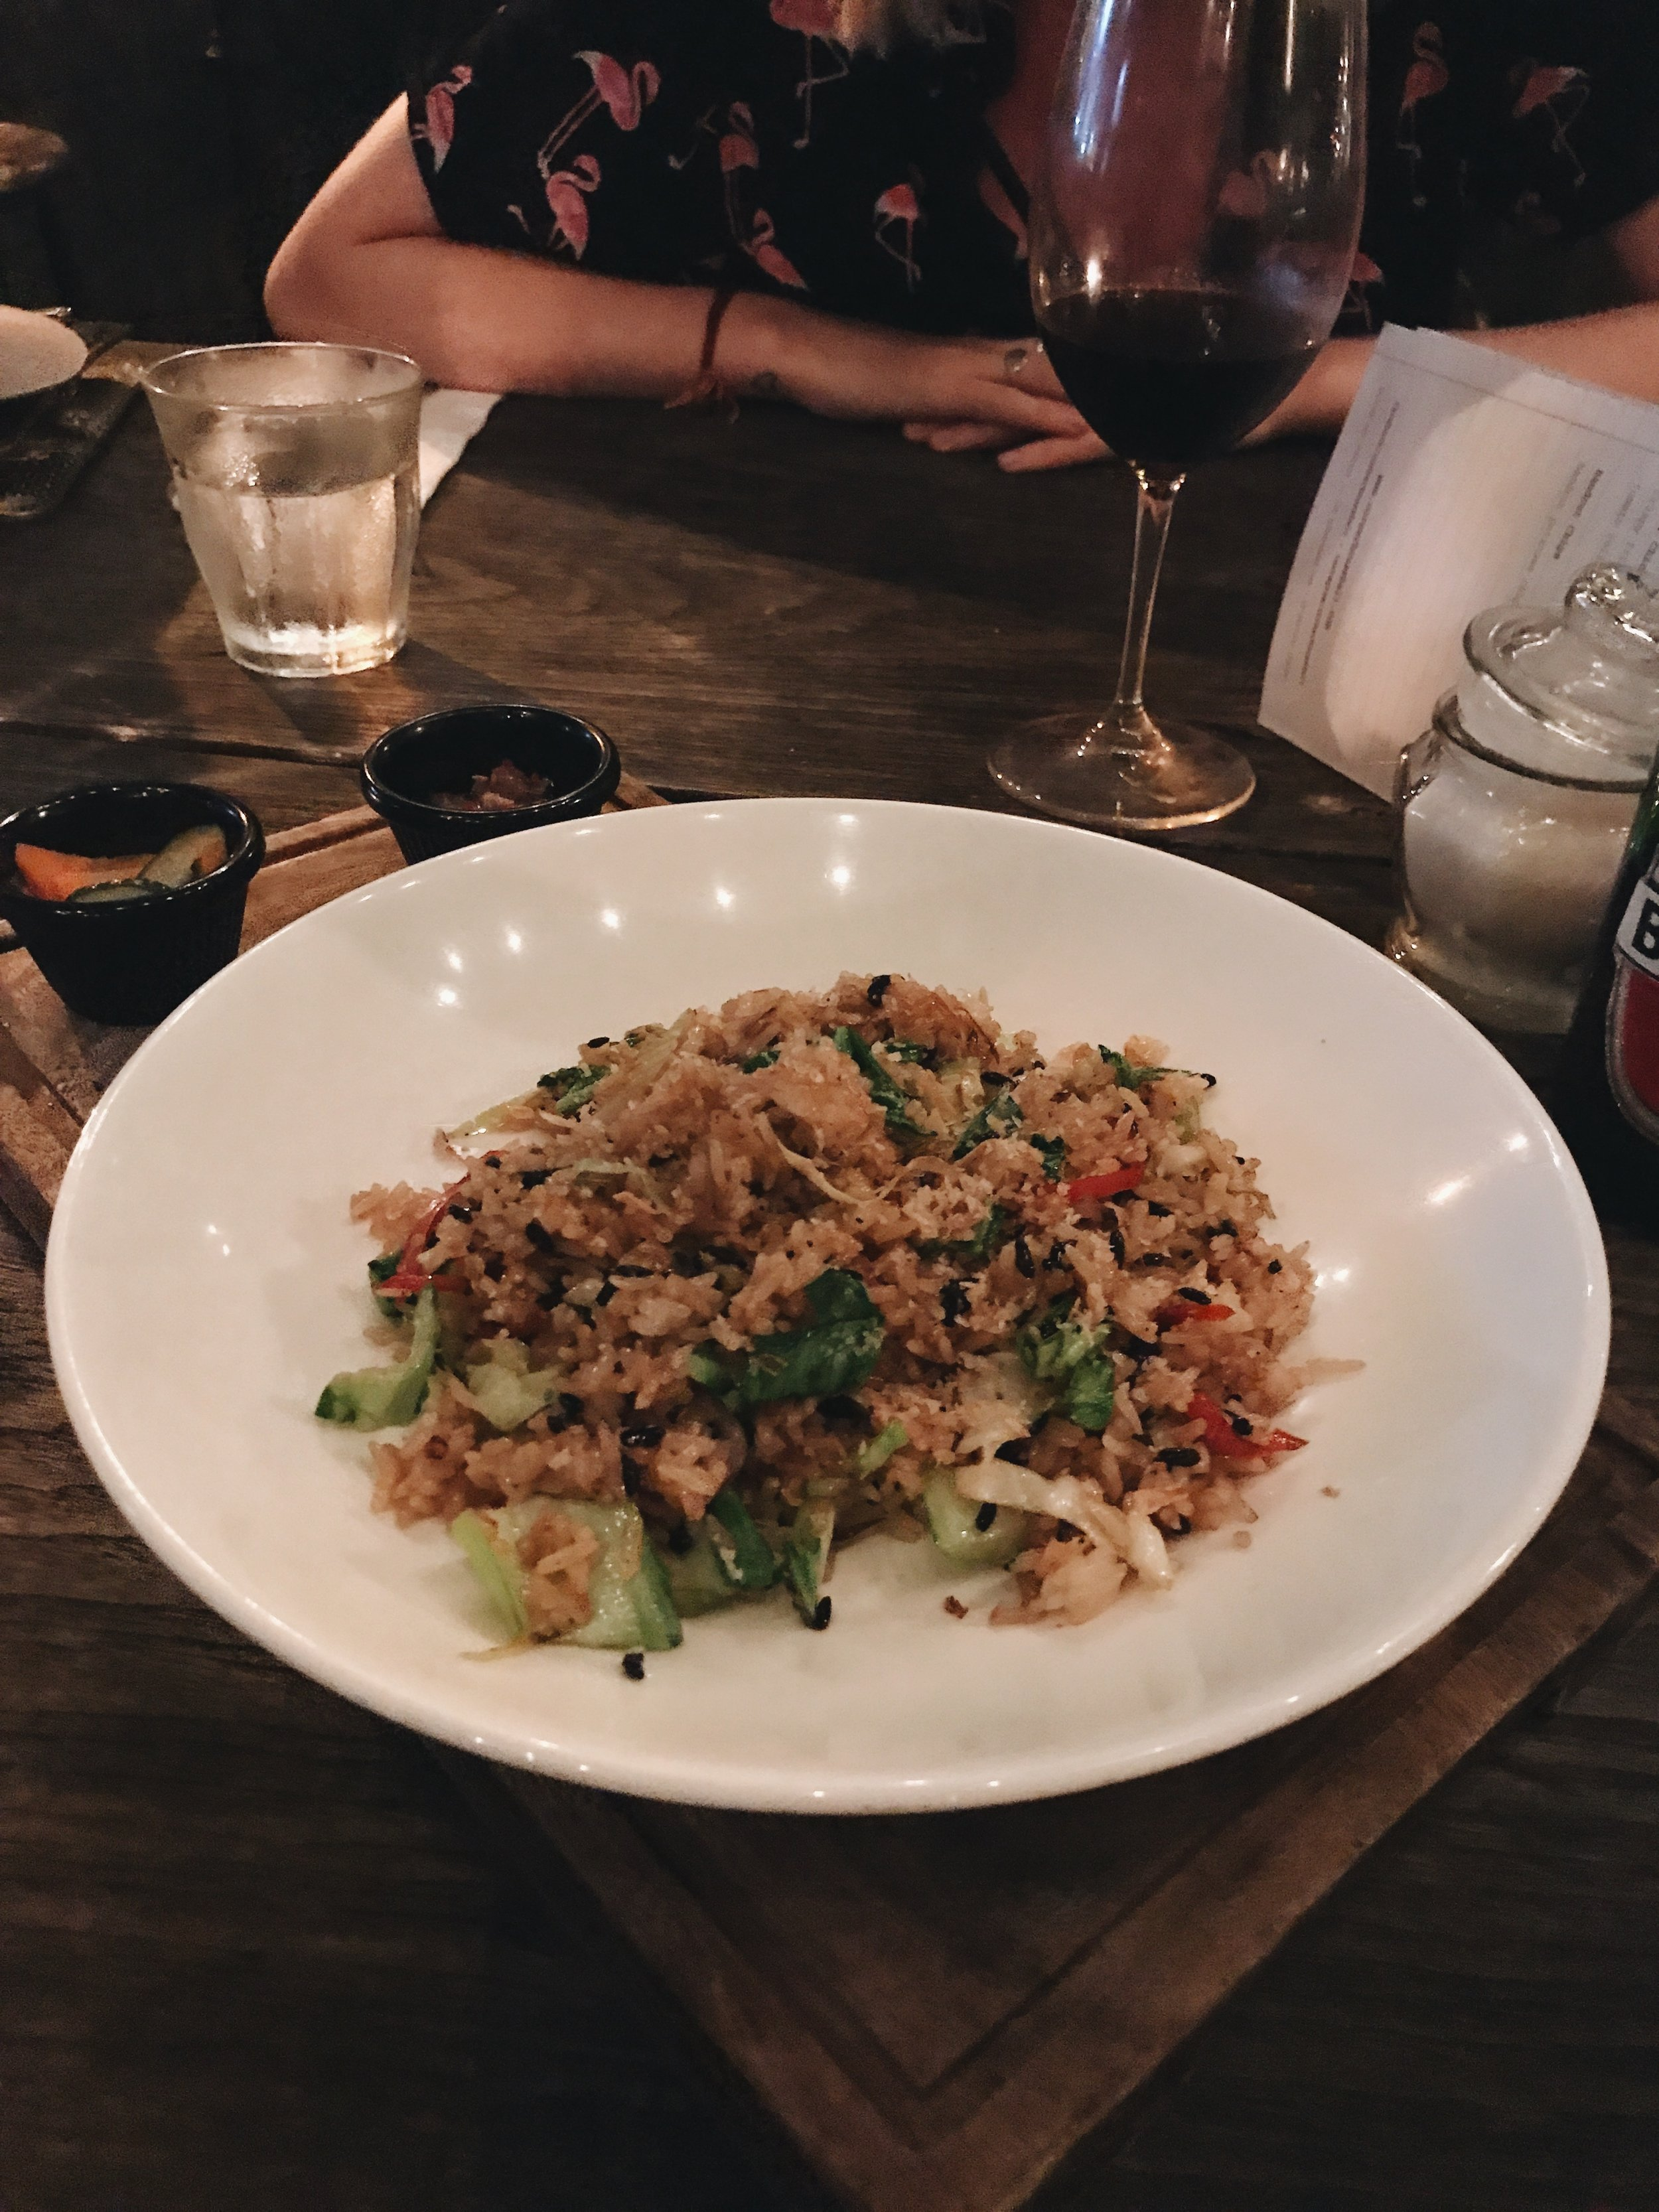 Vegetarian nasi goreng with no eggs